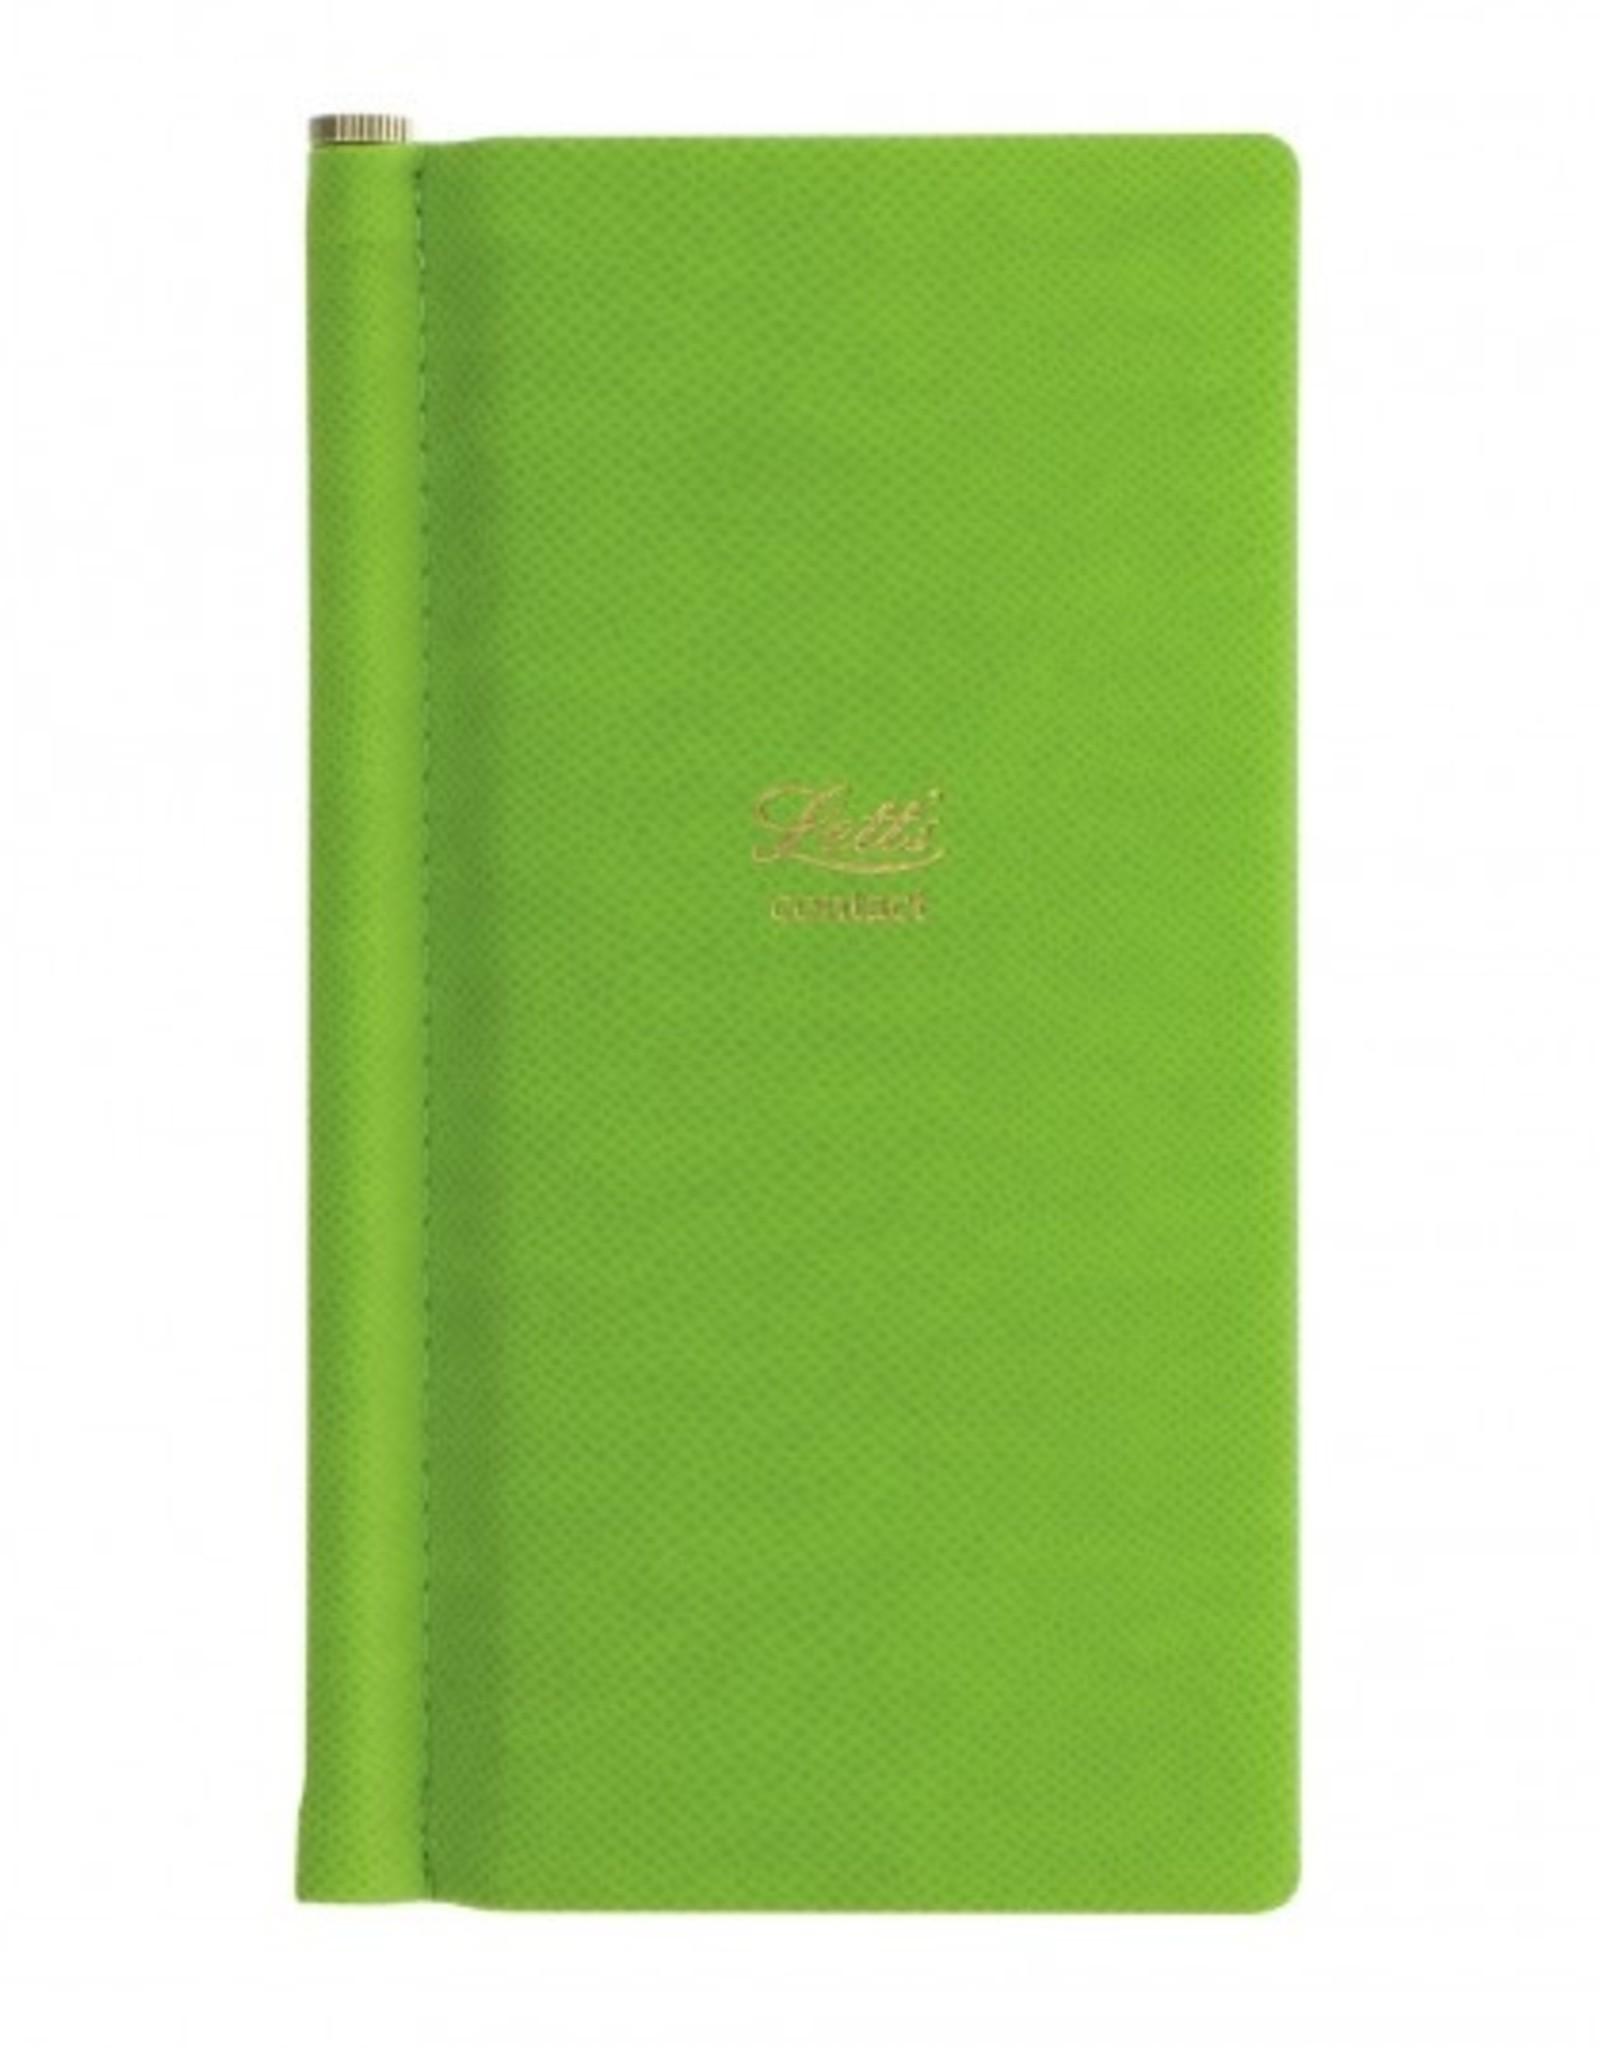 Letts of London Legacy Slim Pocket Address Book